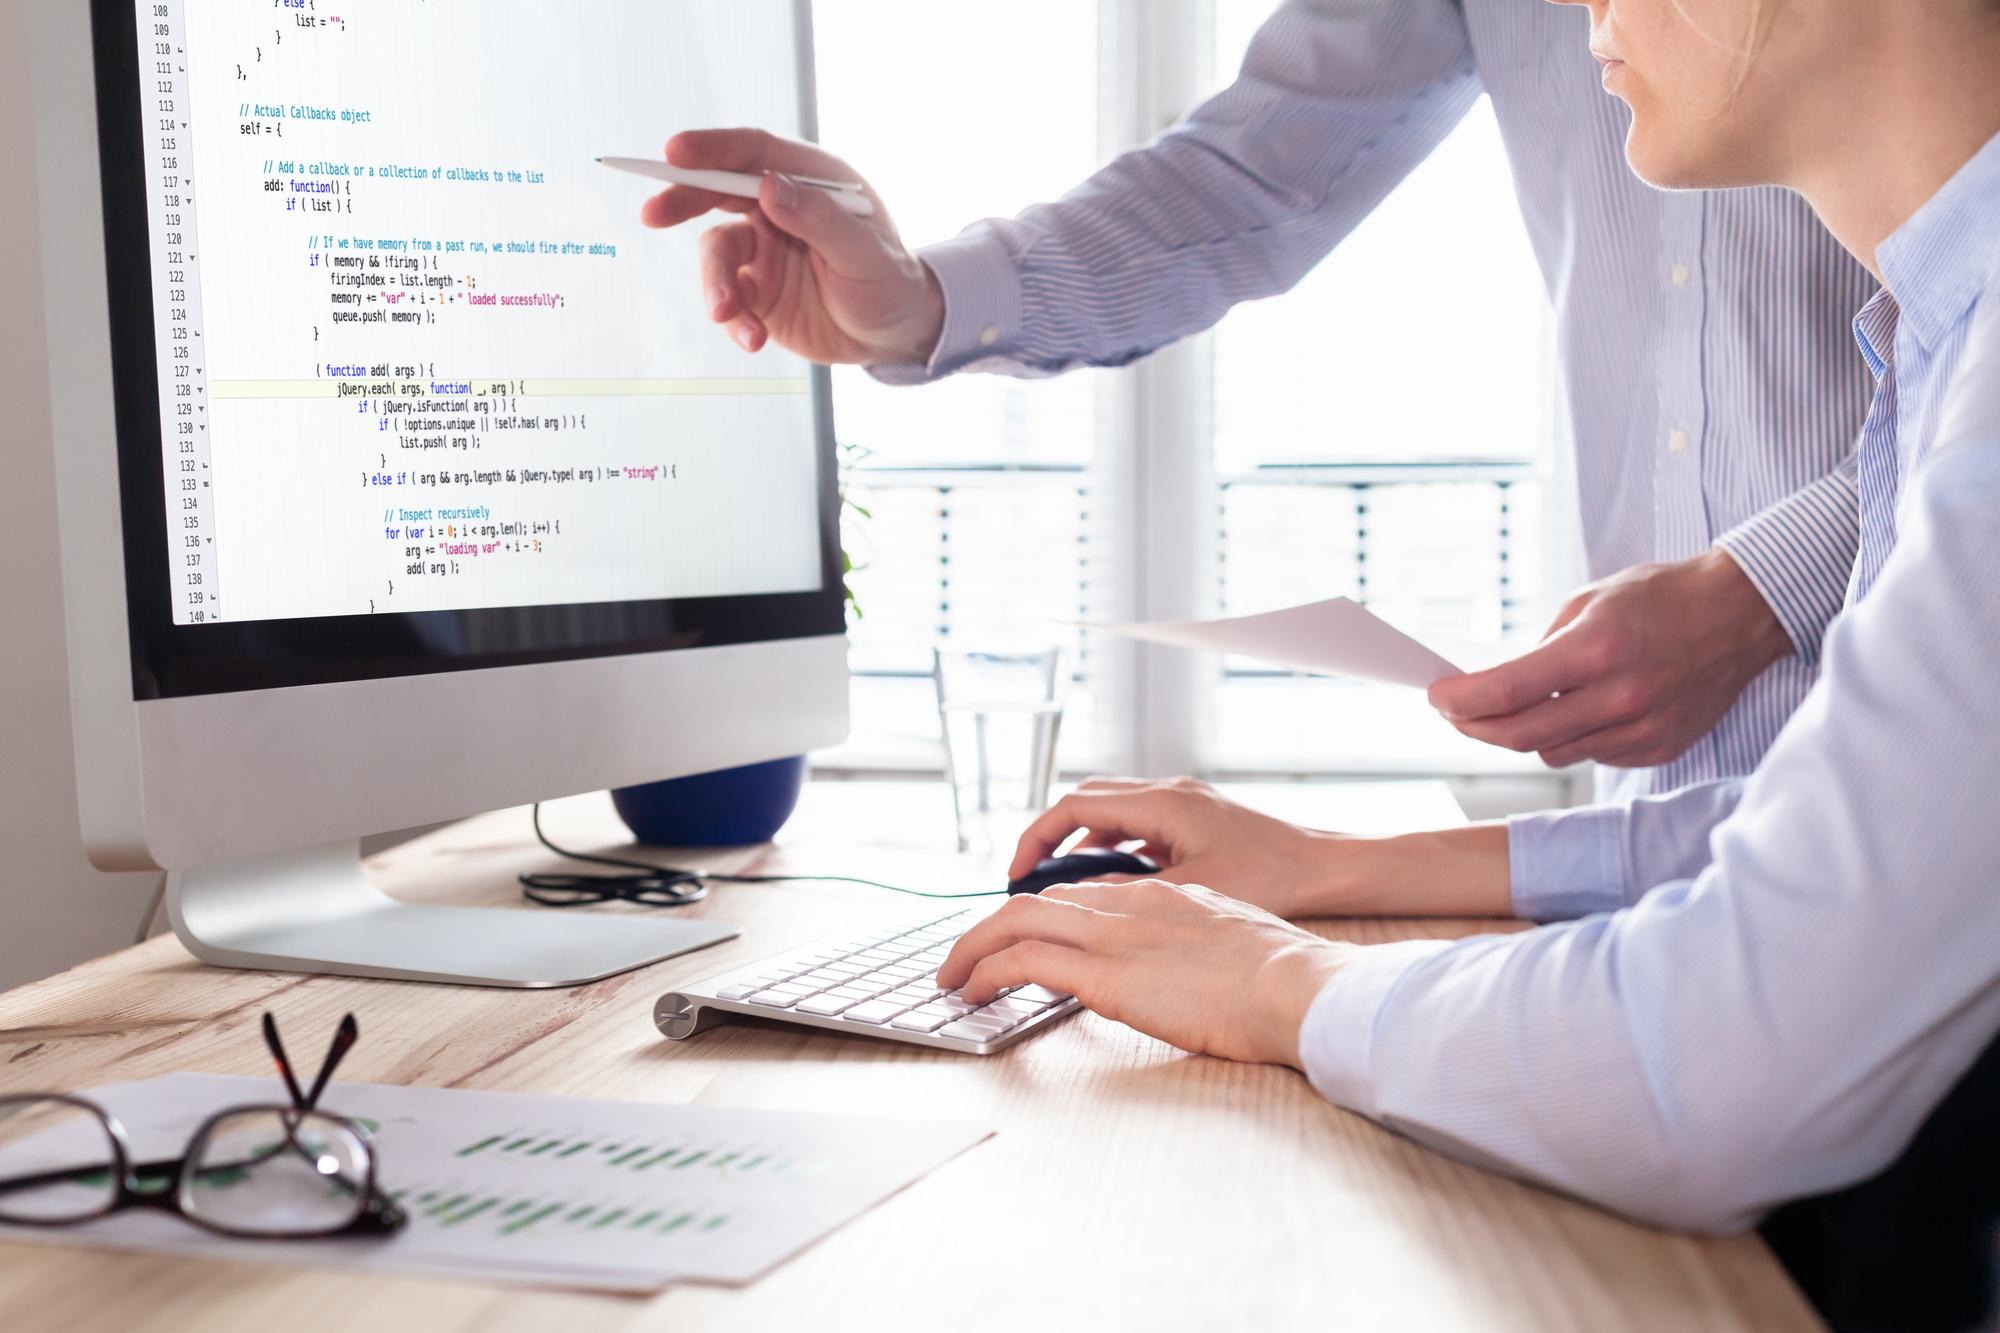 web app developers coding website source code, debugging